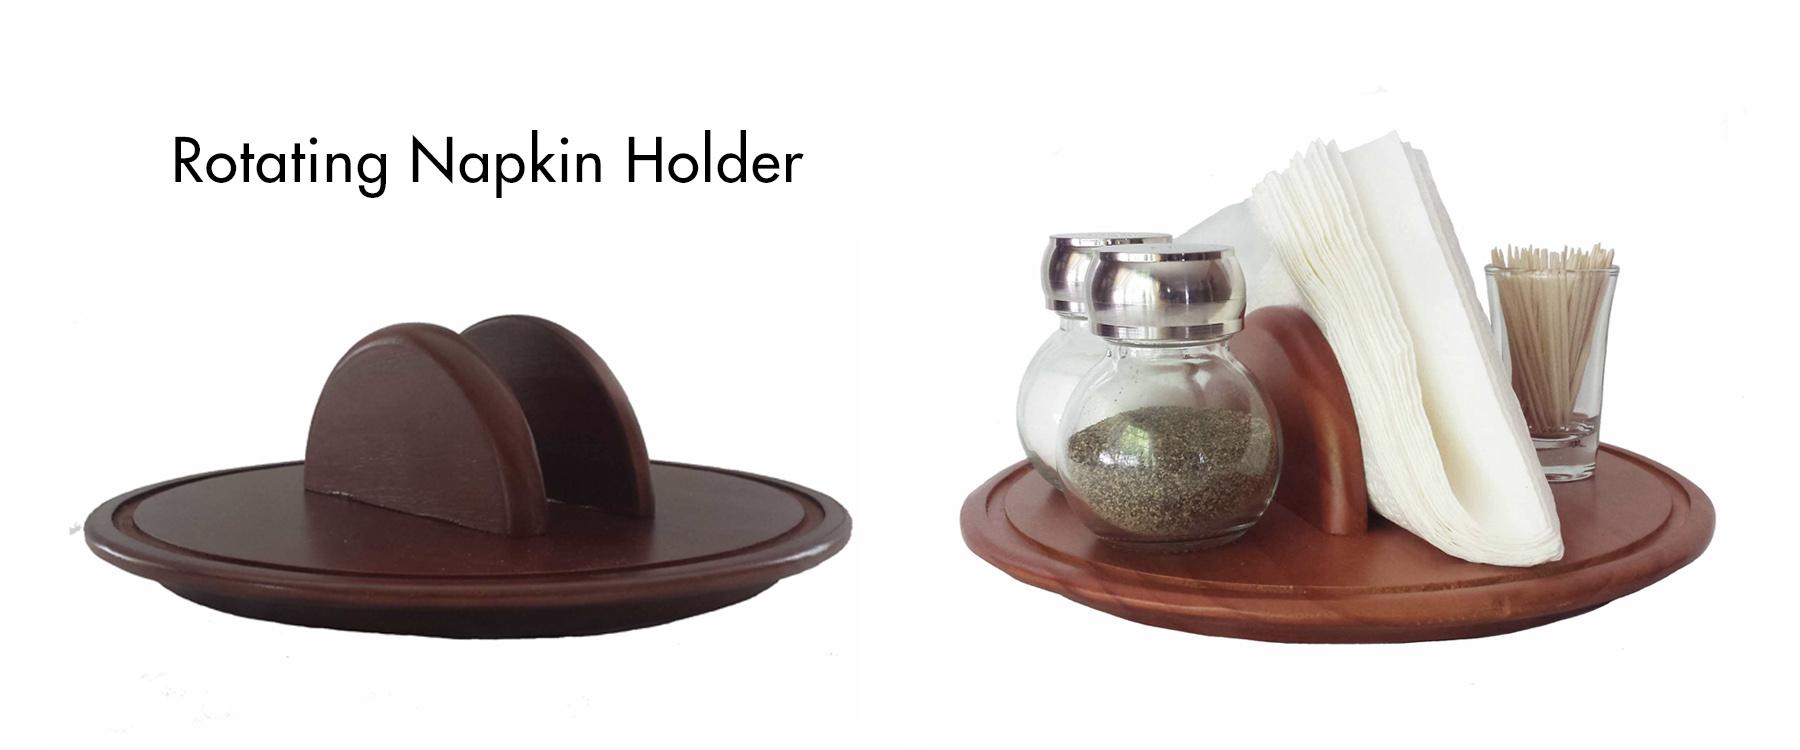 Napkin-Holder-Home-slideshow2.jpg